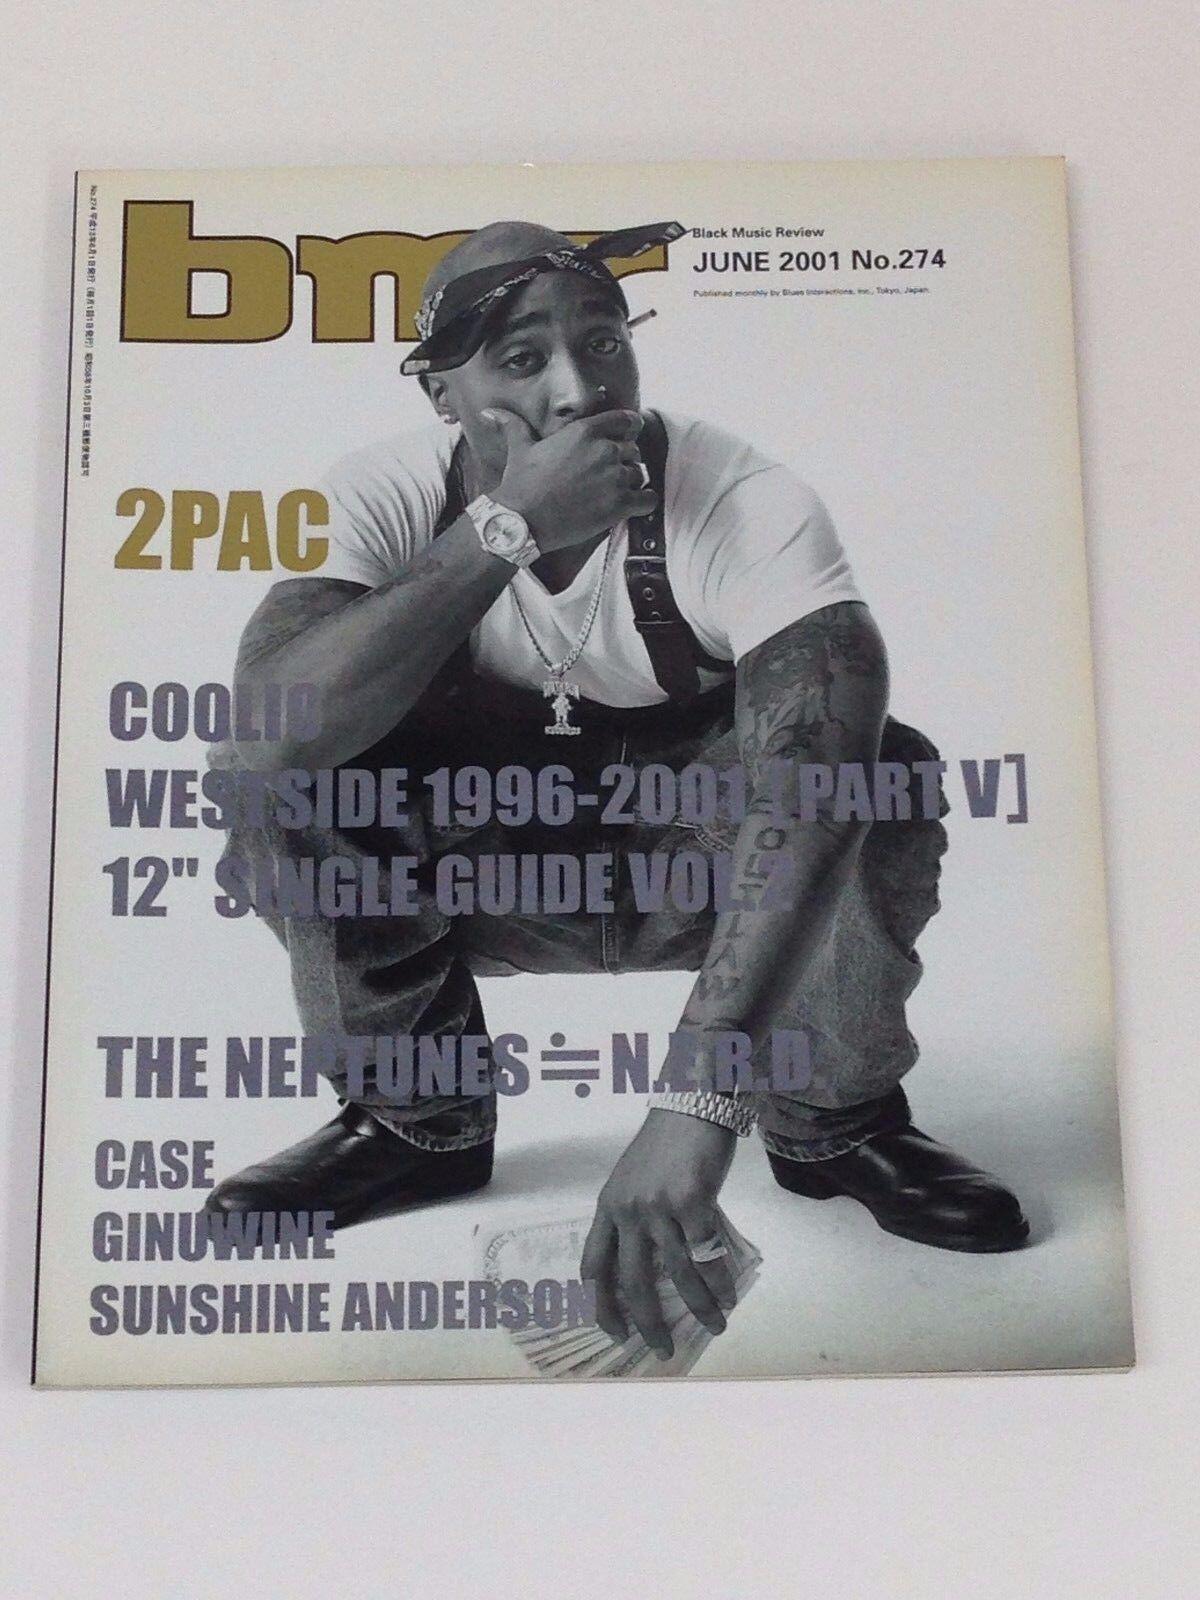 BMR Japan Magazine June 2001 Tupac Shakur 2pac Coolio Noreaga Jay-z Pharrell